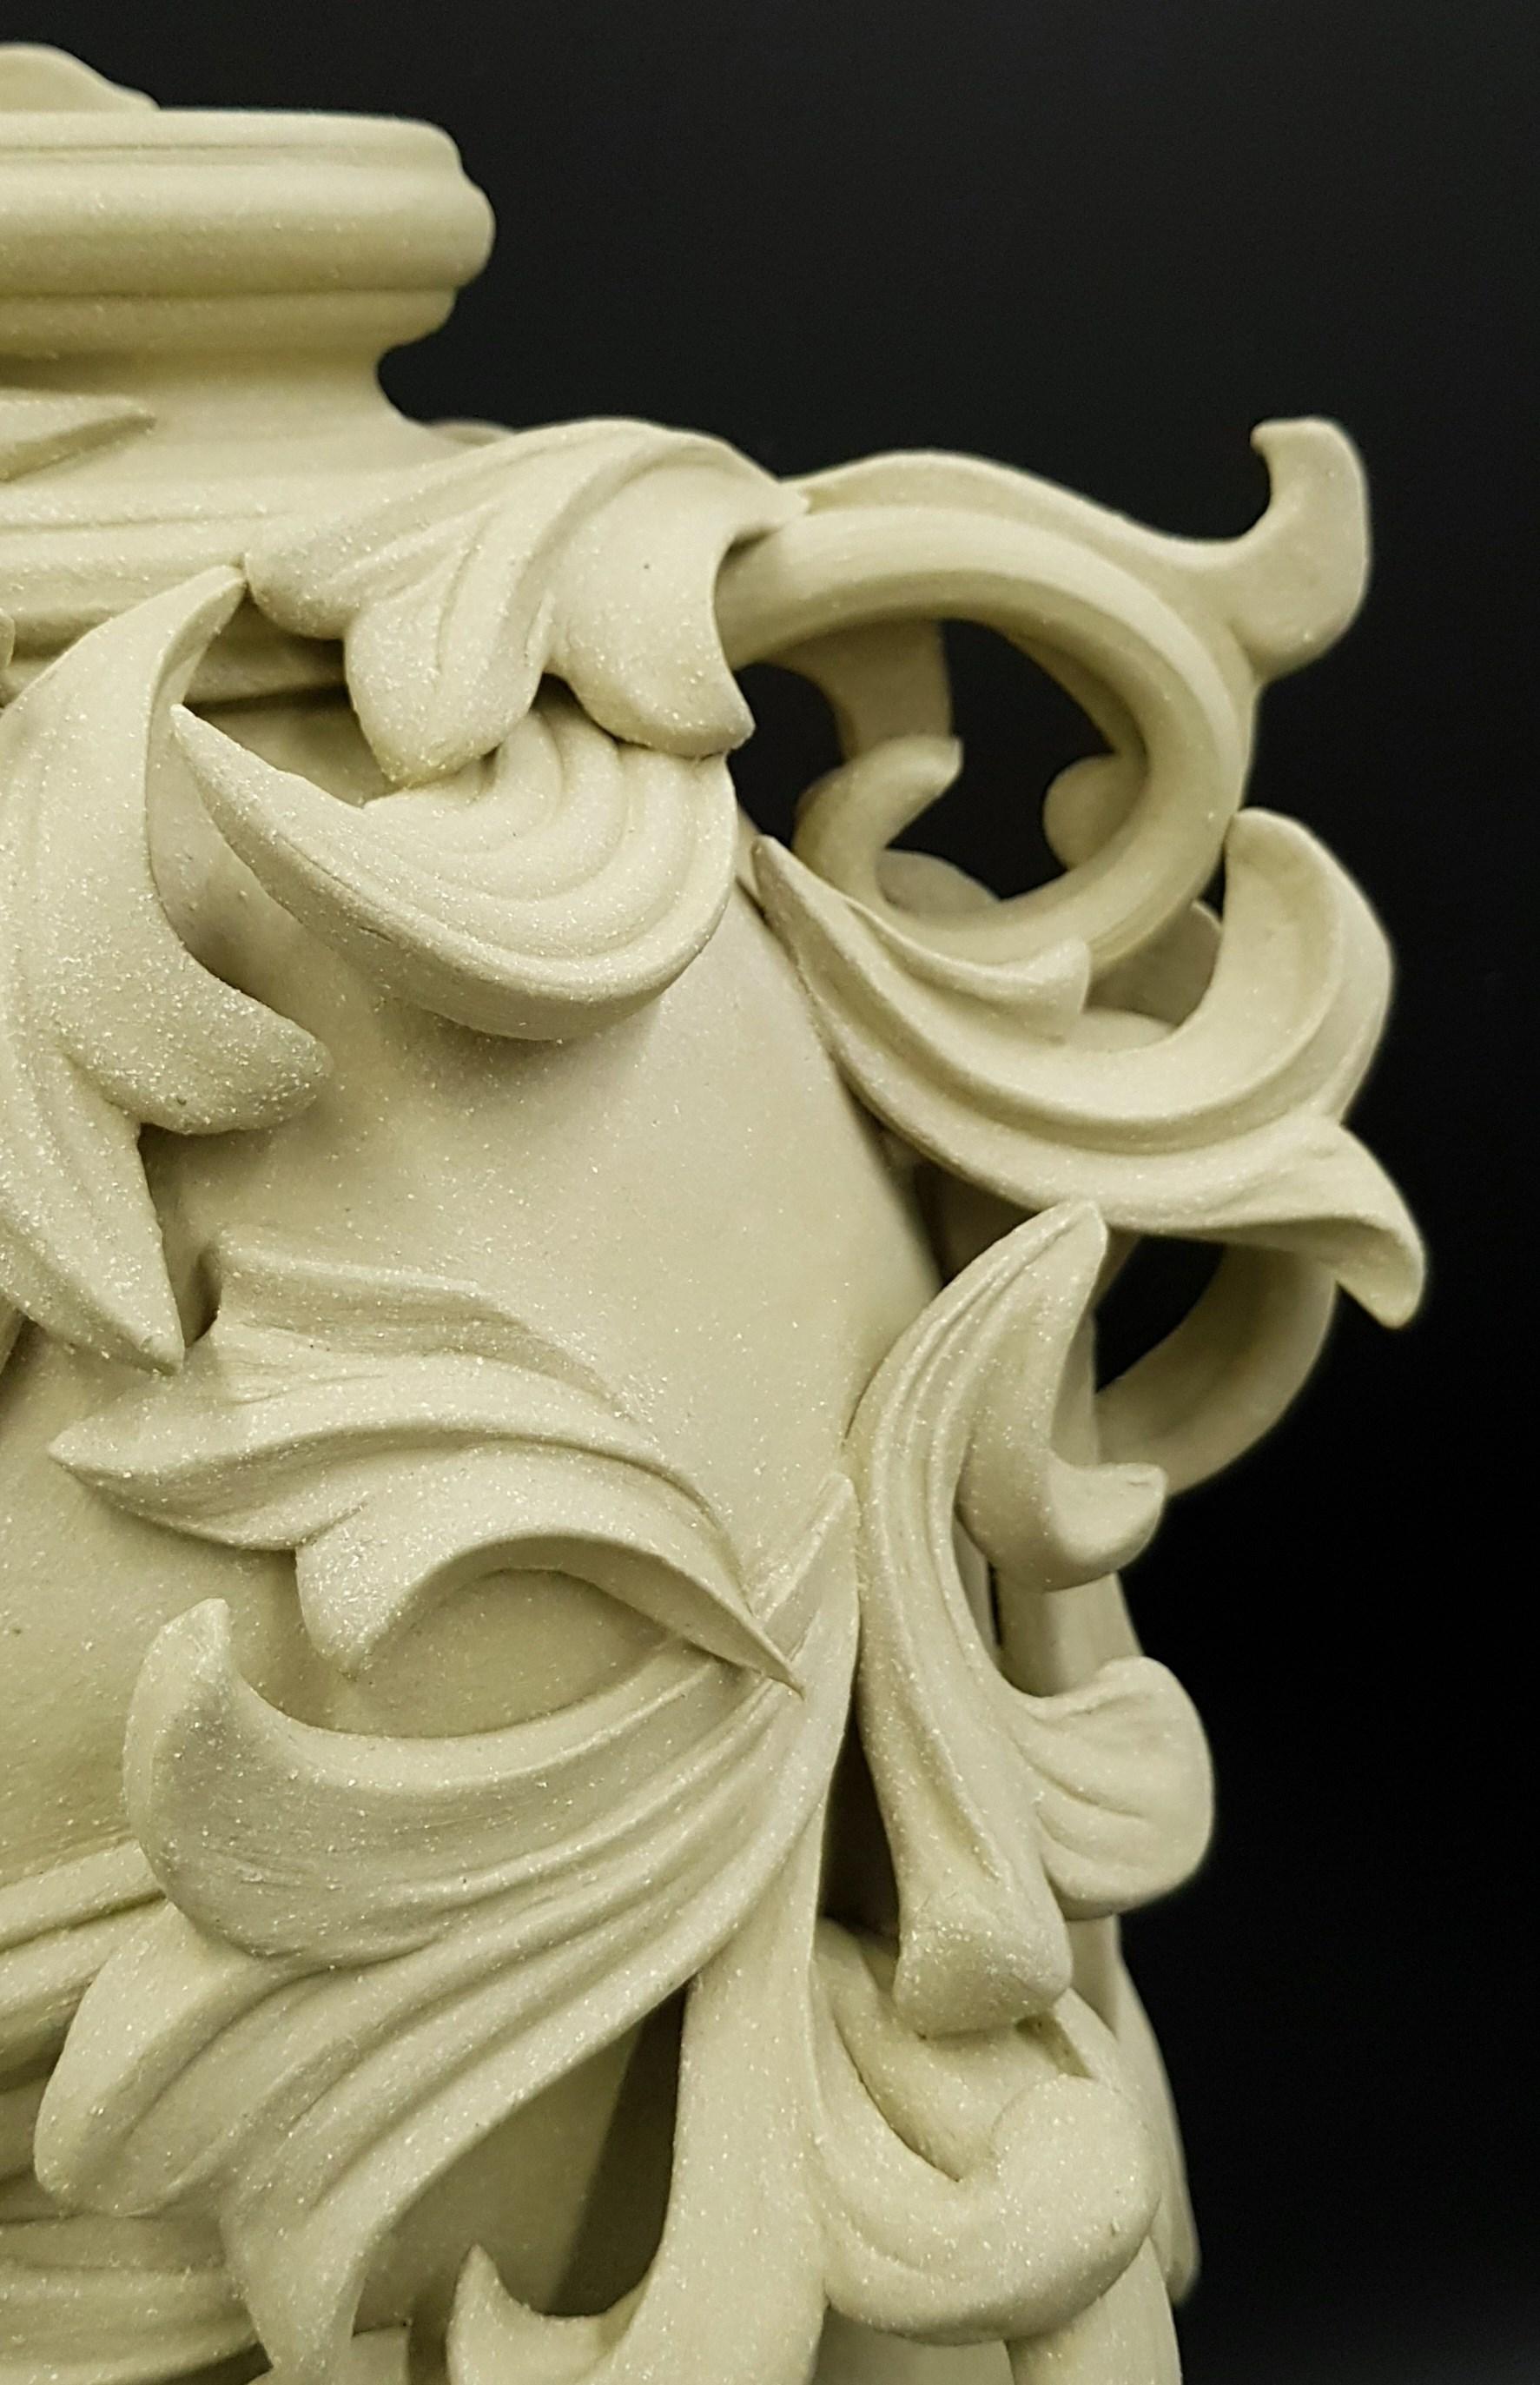 clay vase sculpture detail jo taylor